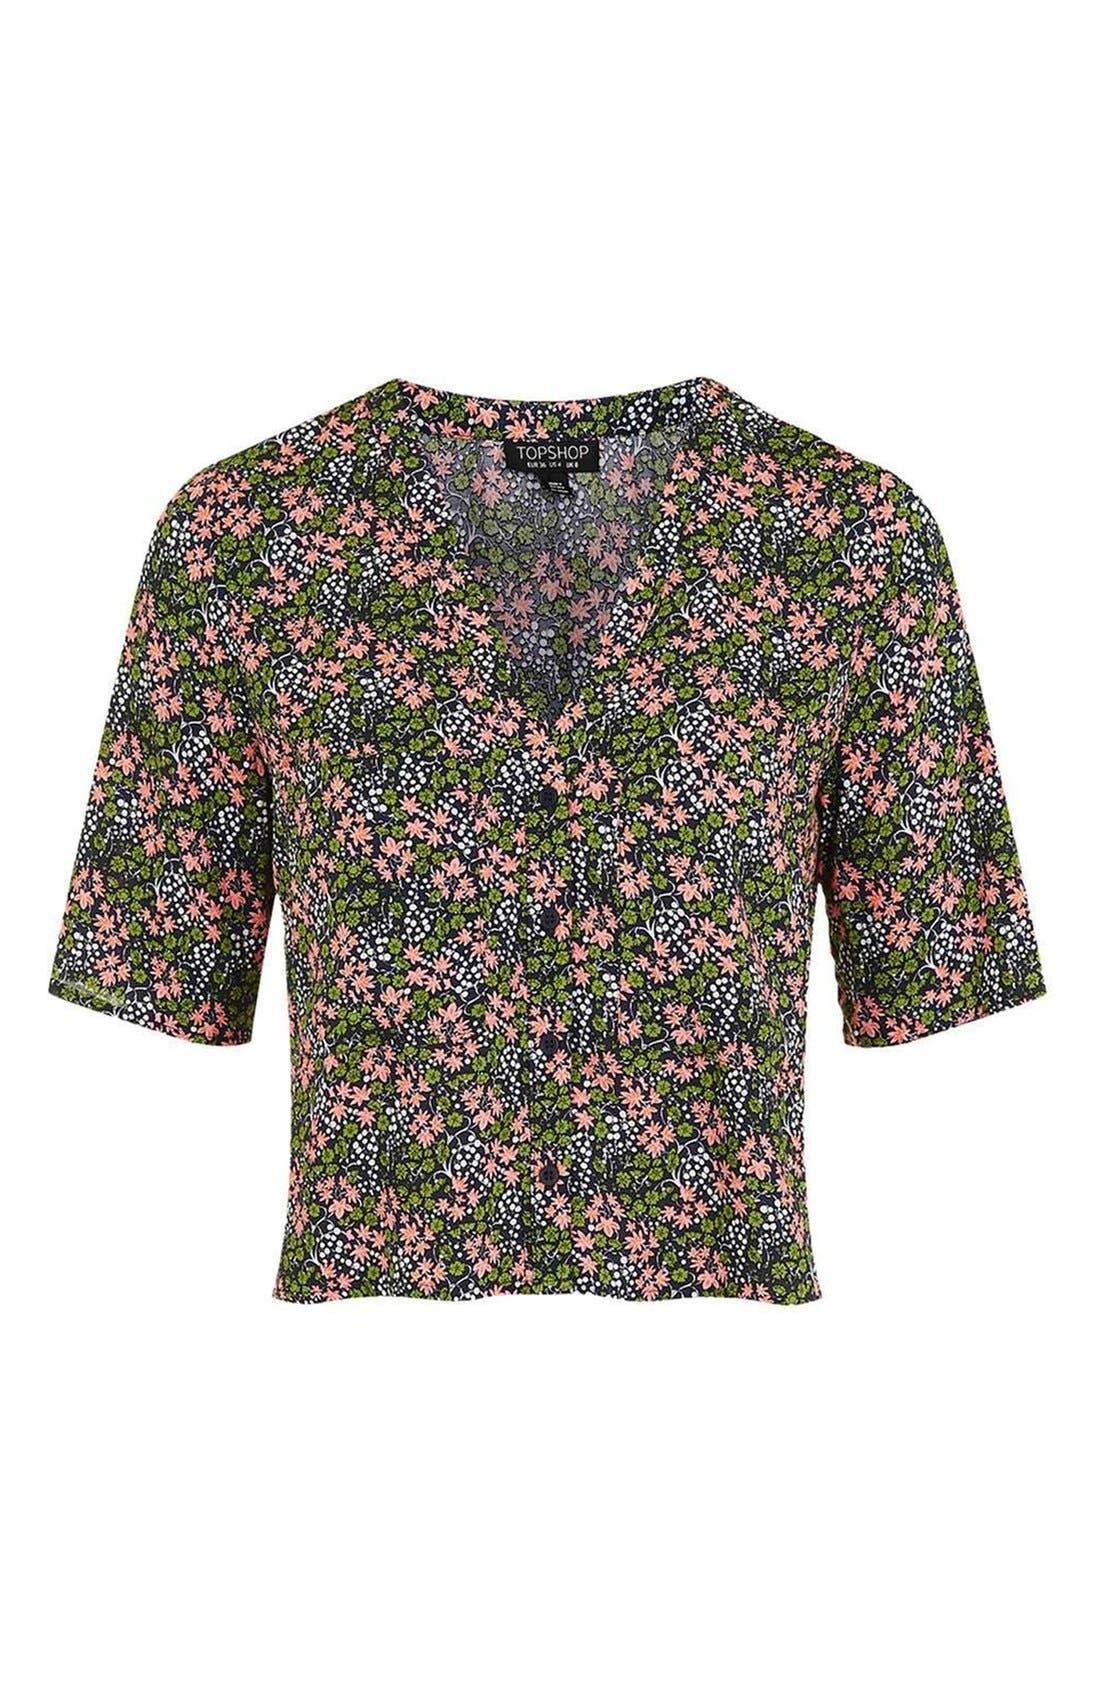 Alternate Image 5  - Topshop 'Holly' Ditsy Floral Print Shirt